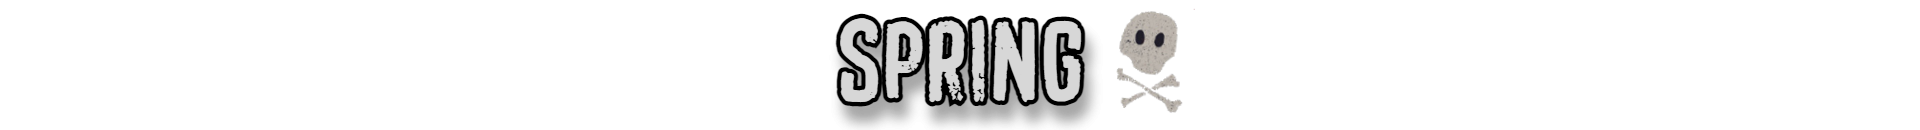 Spring.png.4643efd6ce2693a5ab7d9deb7821e6a6.png